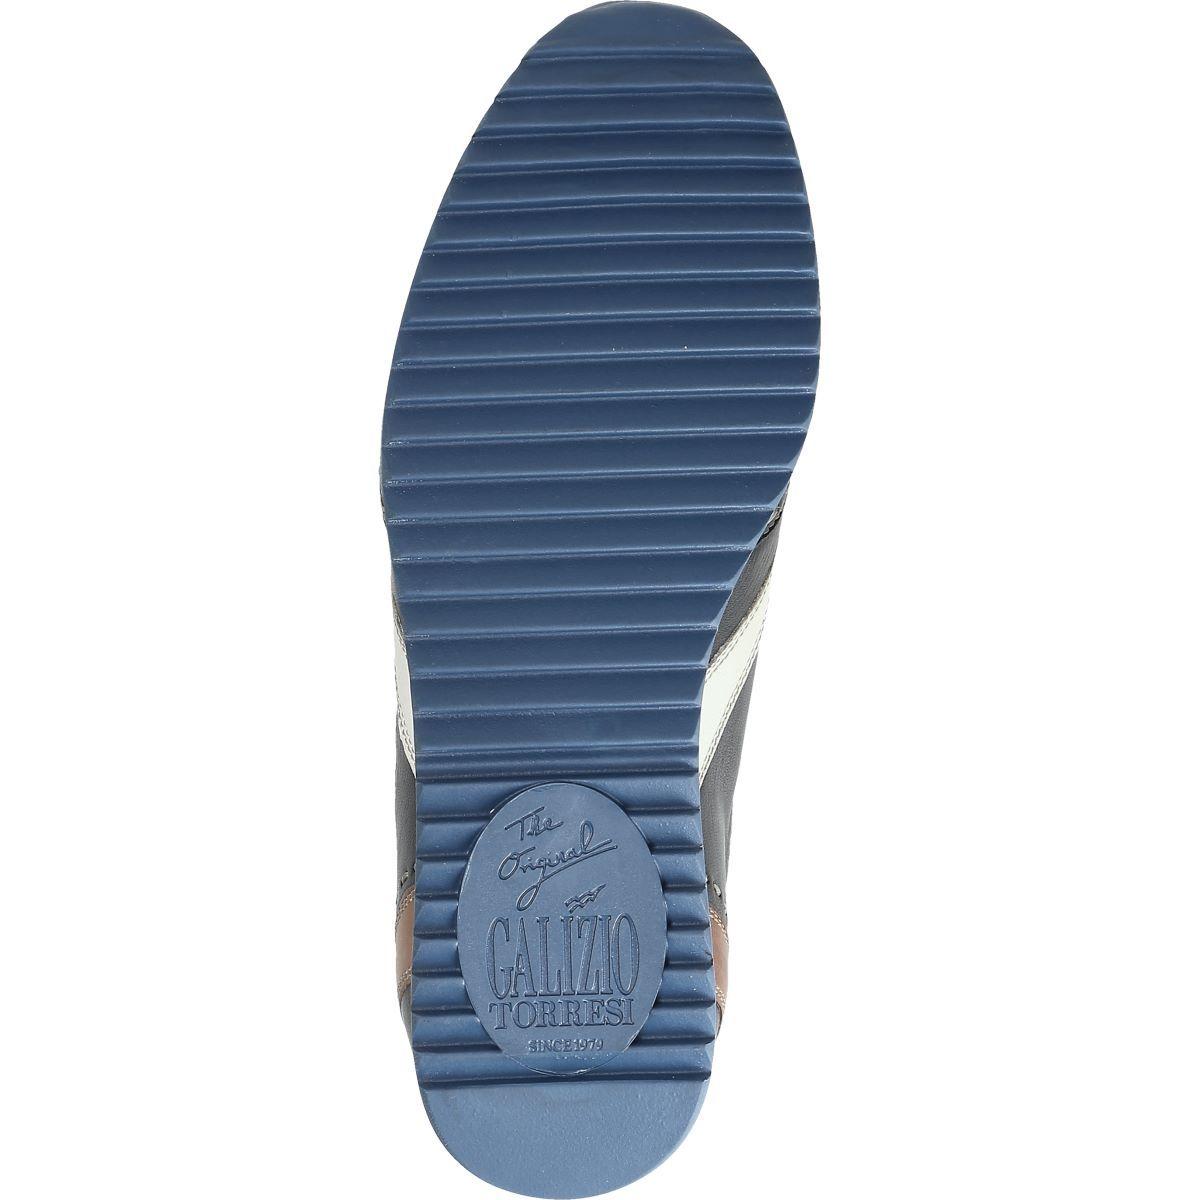 Buy Galizio Torresi Shoes